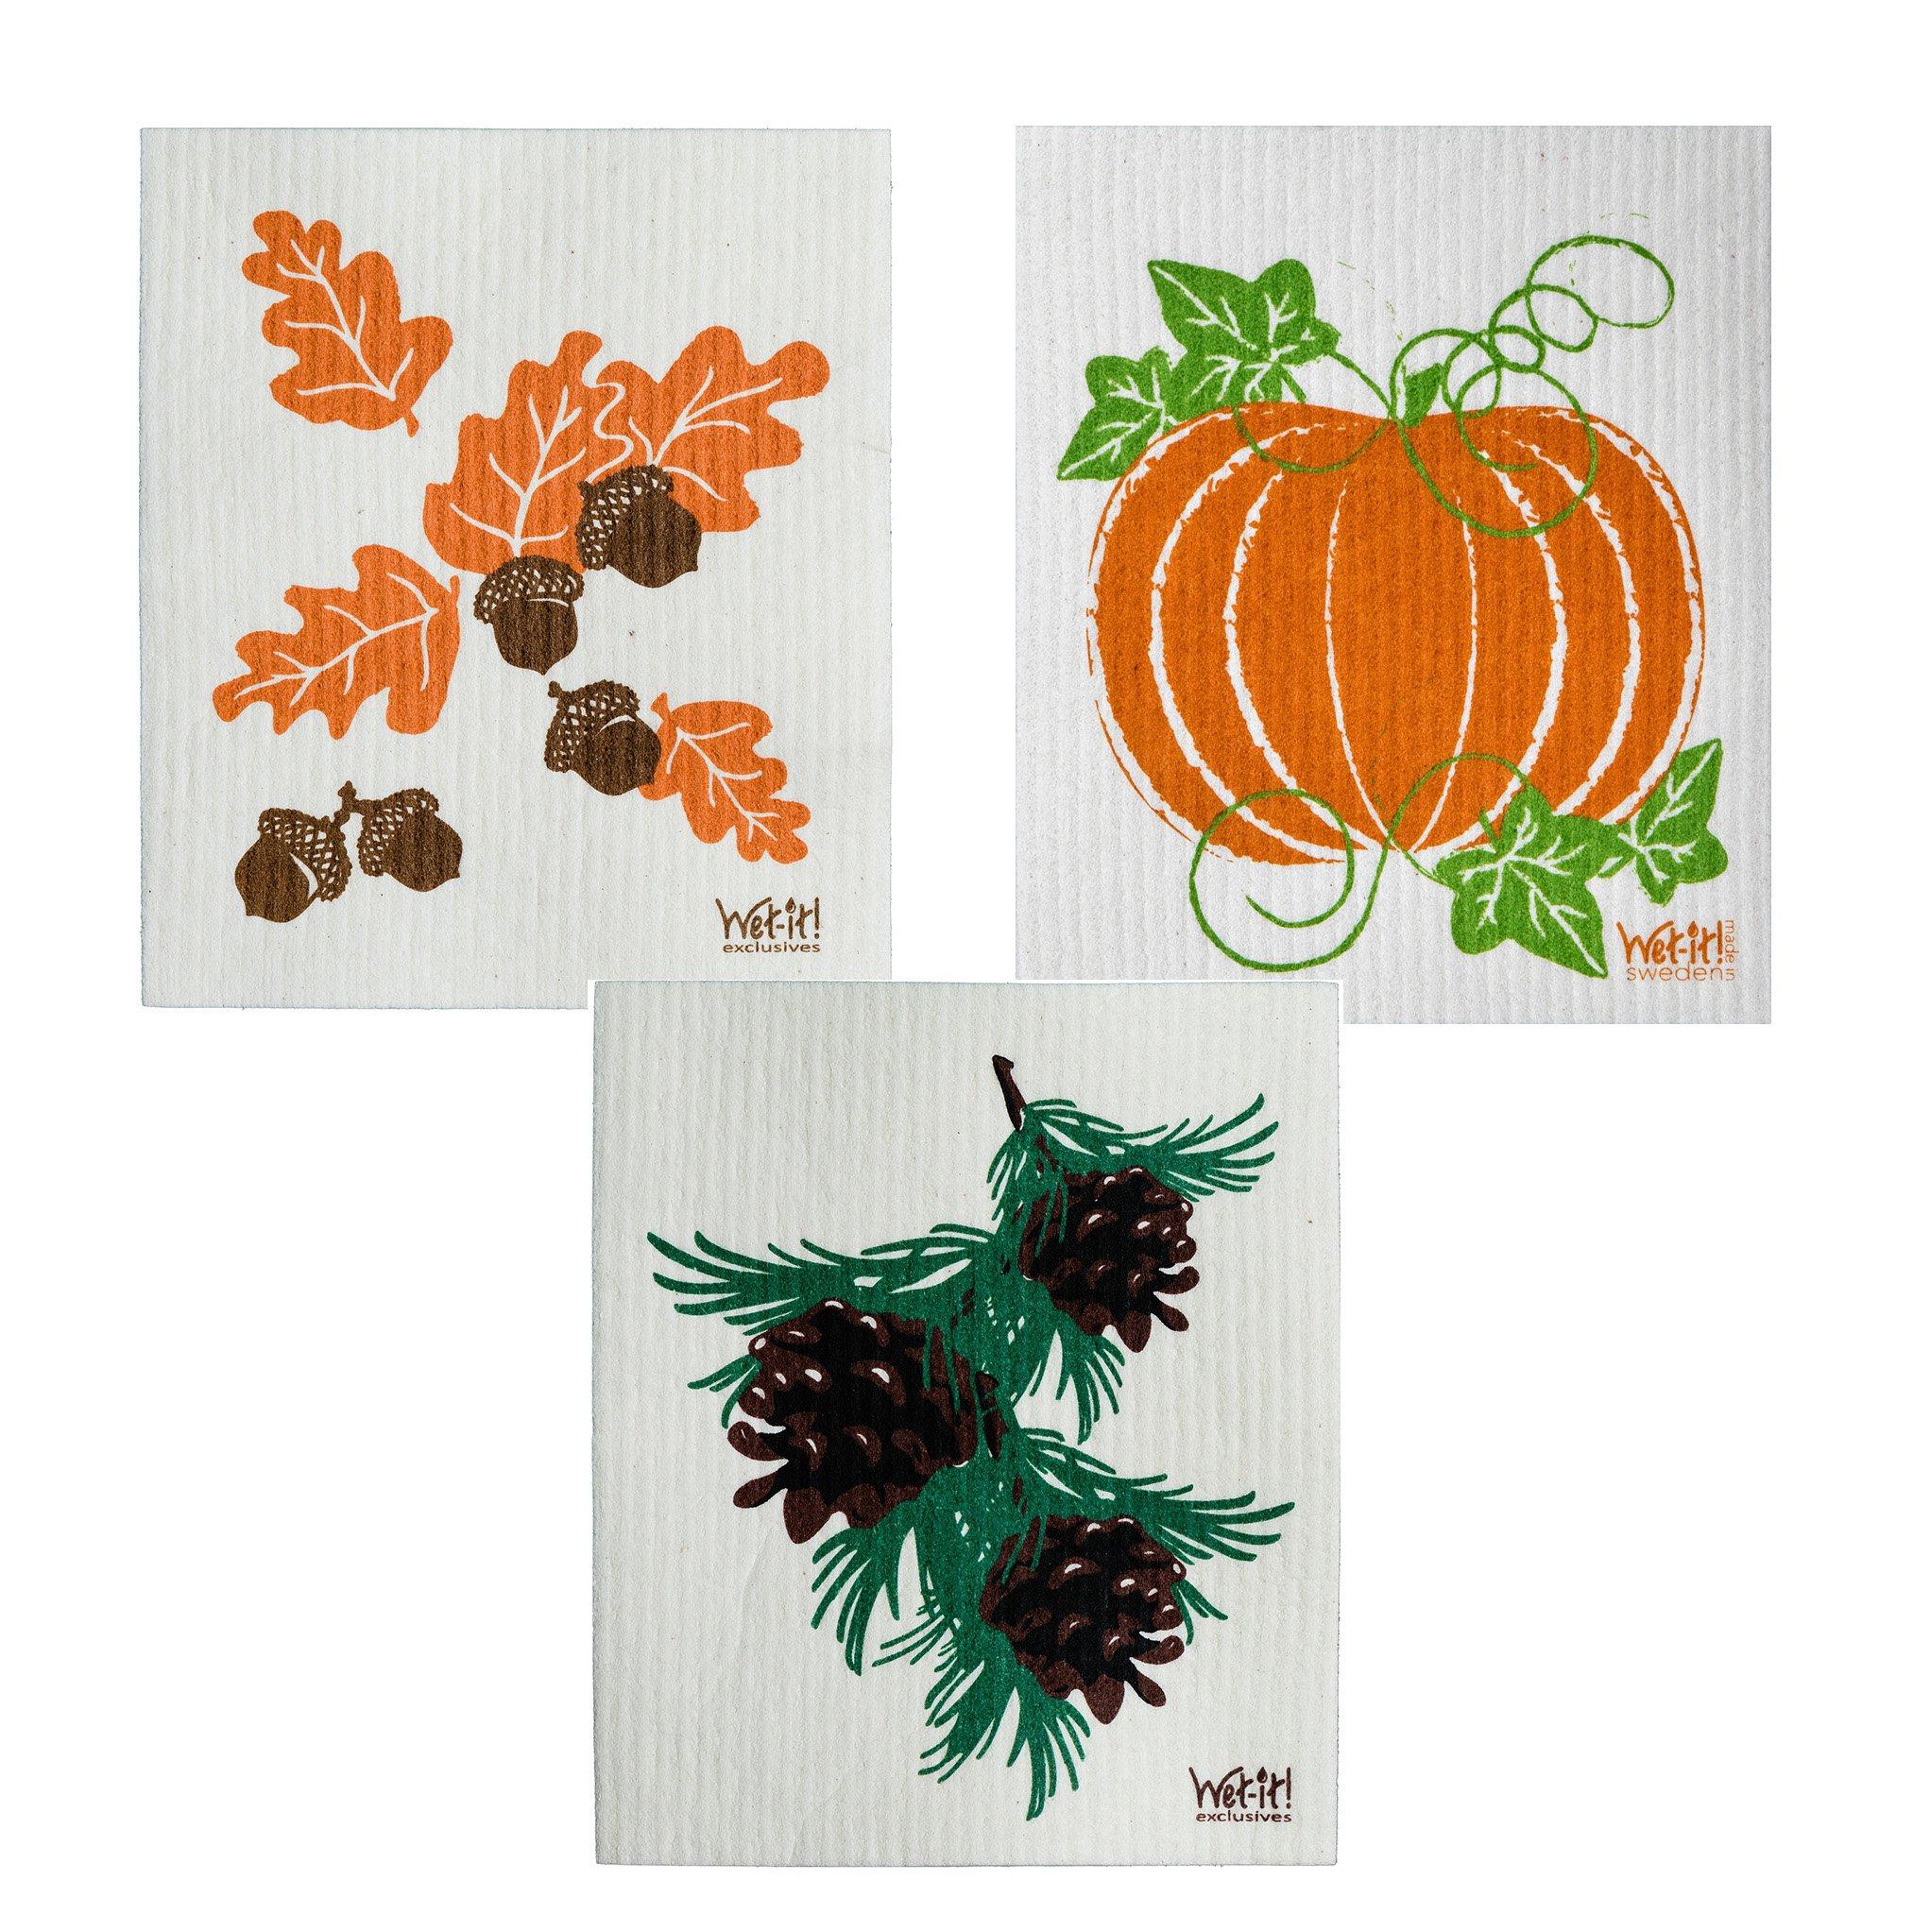 Wet-It Swedish Dishcloth Set of 3 - Fall Leaves and Acorns, Pinecones, Pumpkin - NEW